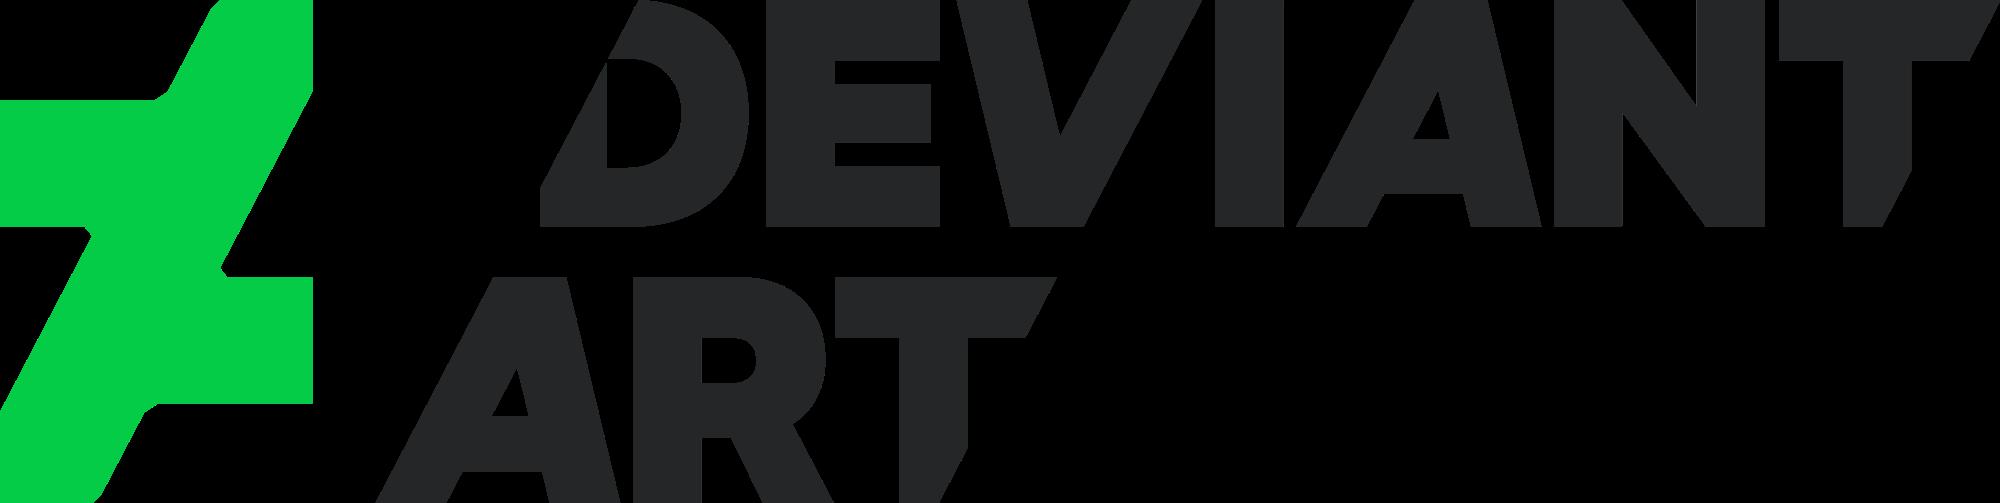 Deviantart Logo PNG - 10634